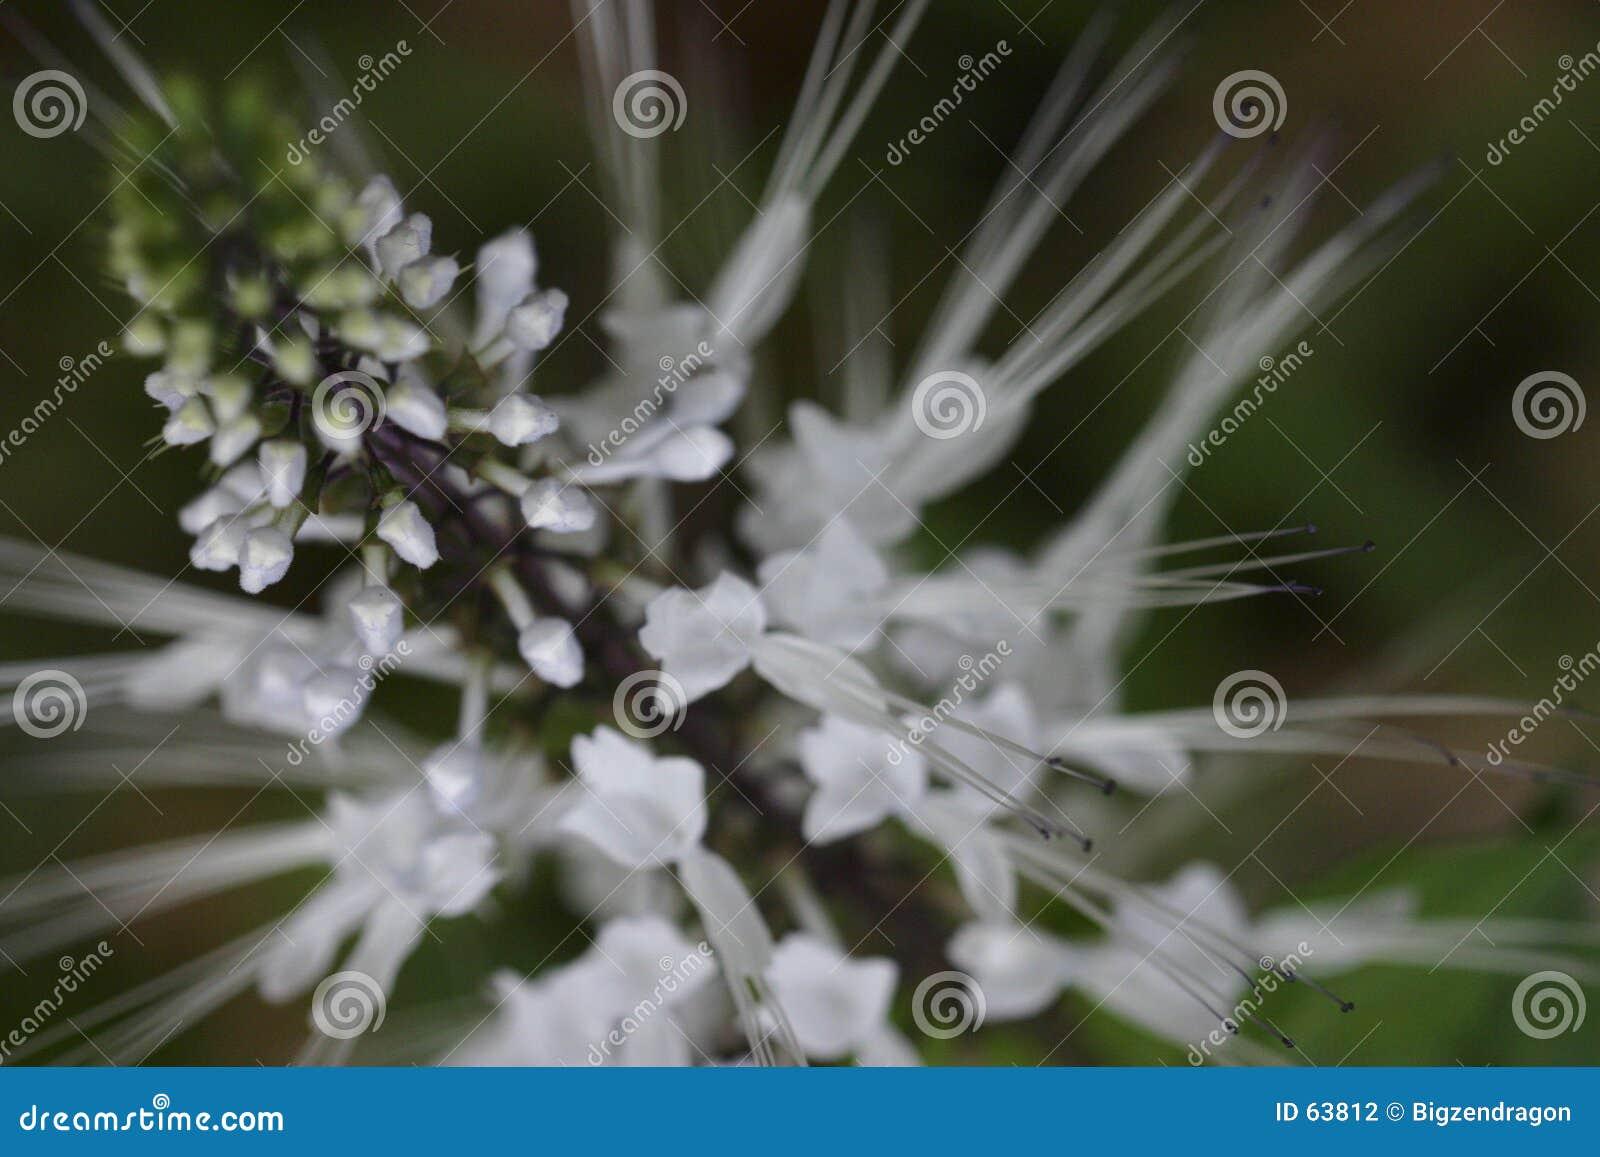 Flor spiky branca